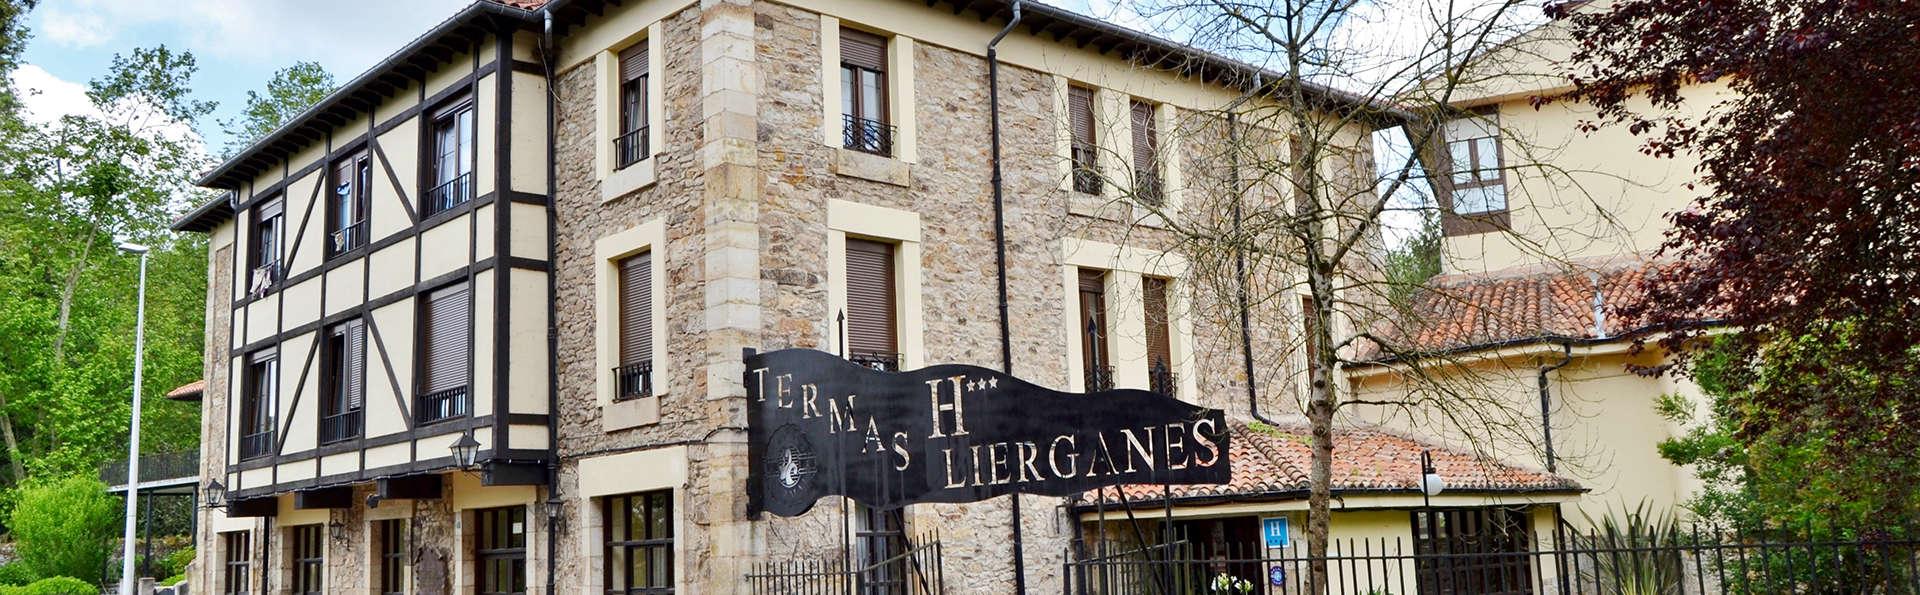 Hotel Termas de Liérganes - EDIT_NEW_front1.jpg